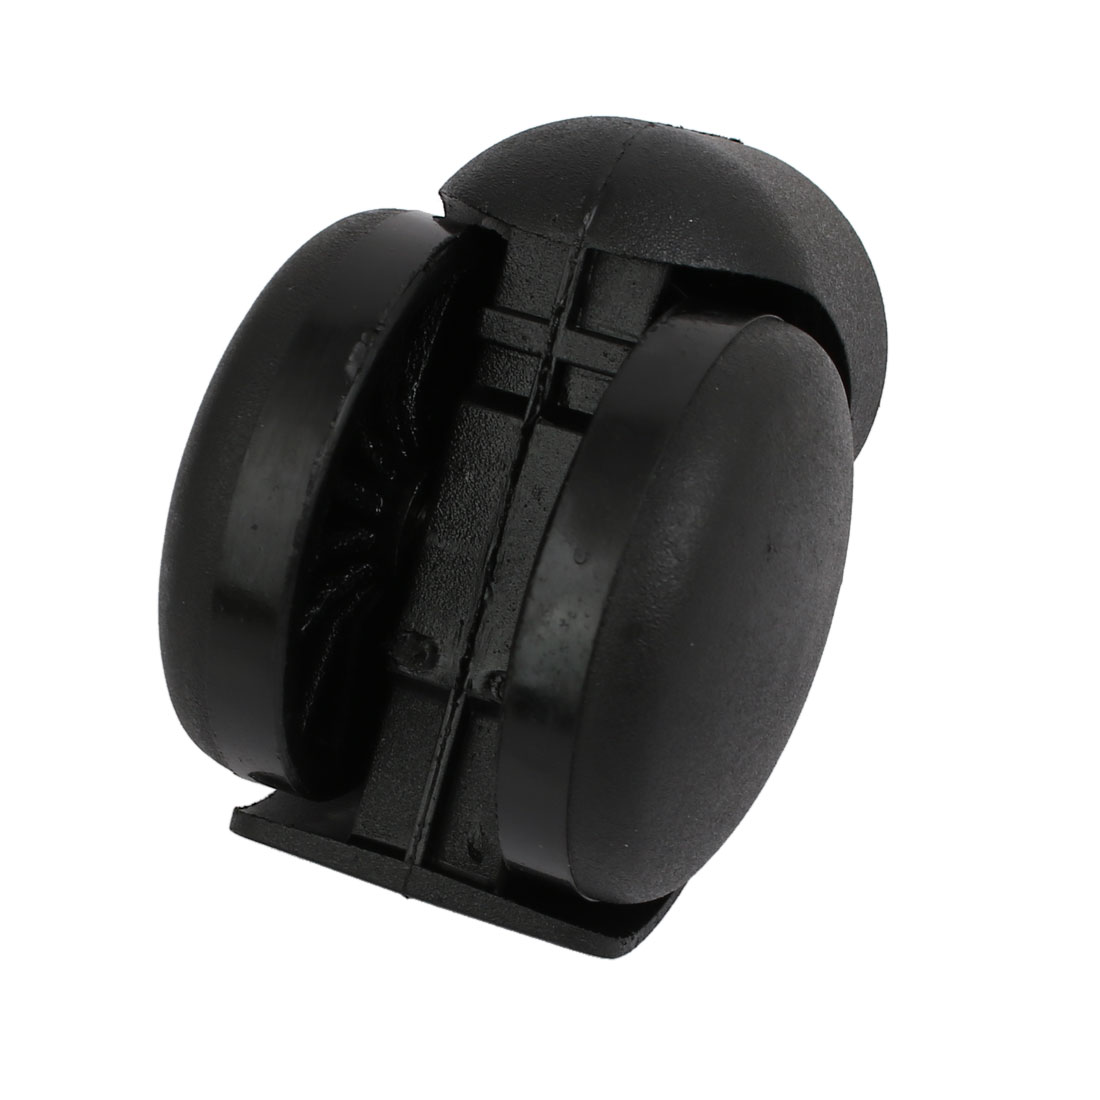 Unique Bargains 50mm Diameter Wheel 11mm Shaft Dia Non-Brake Swiveling Caster Roller Black - image 1 de 2